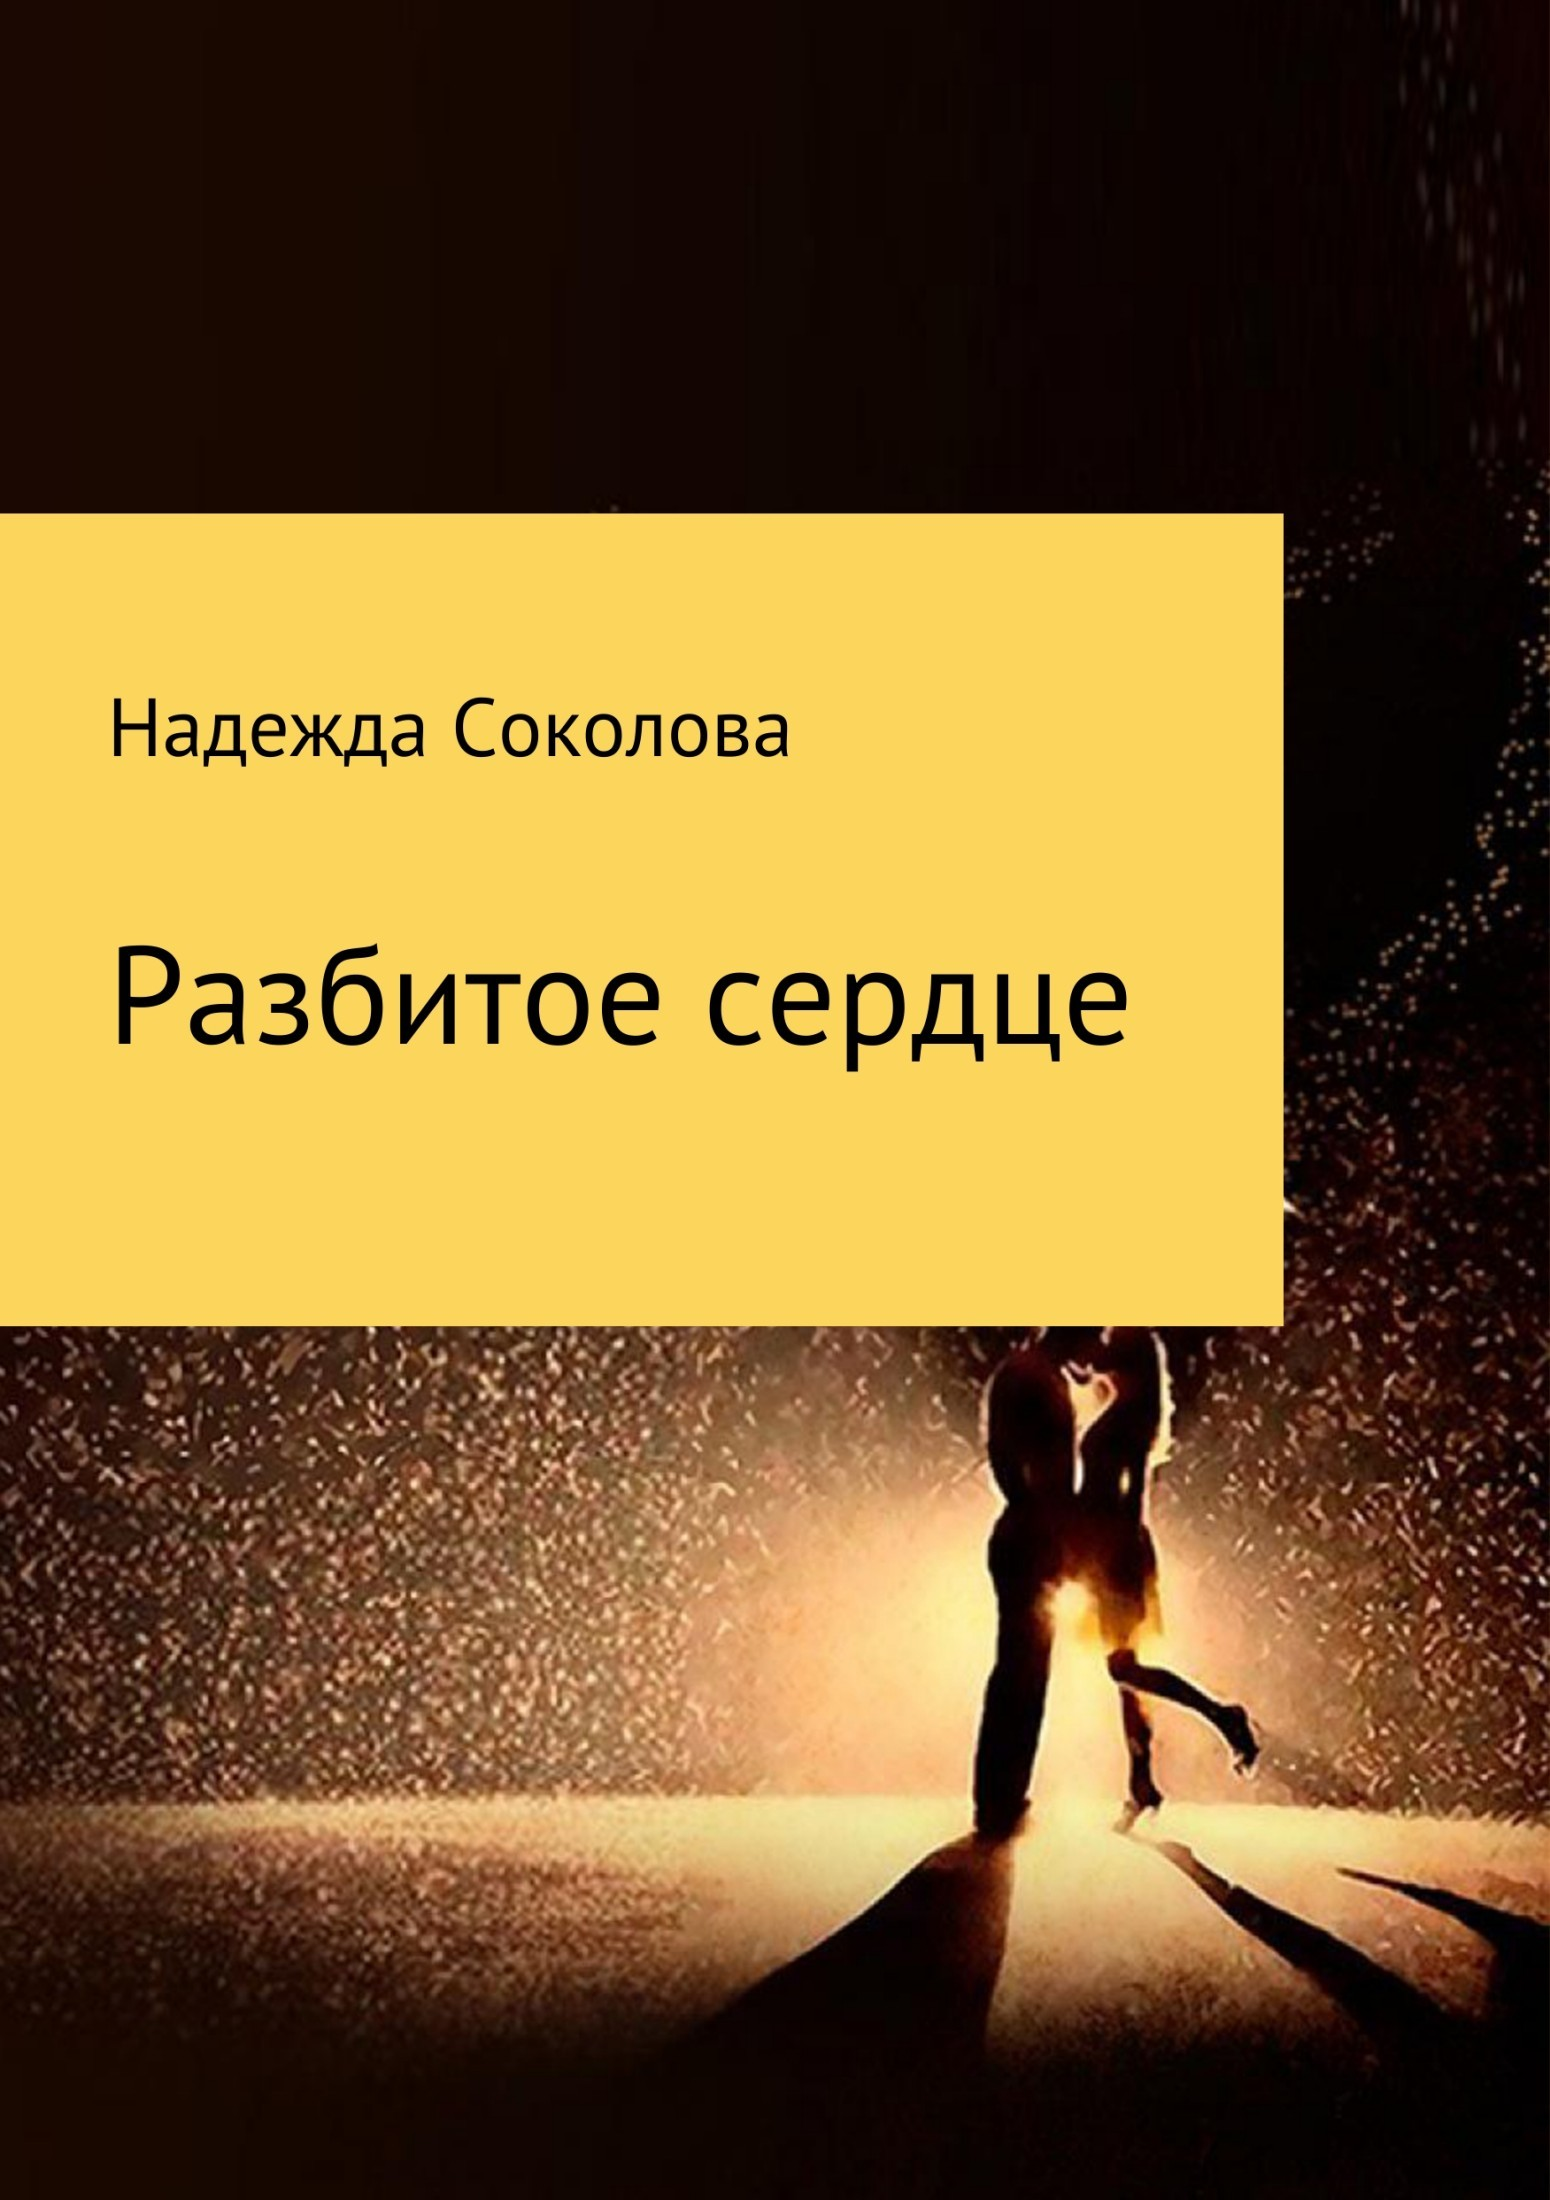 Надежда Игоревна Соколова. Разбитое сердце